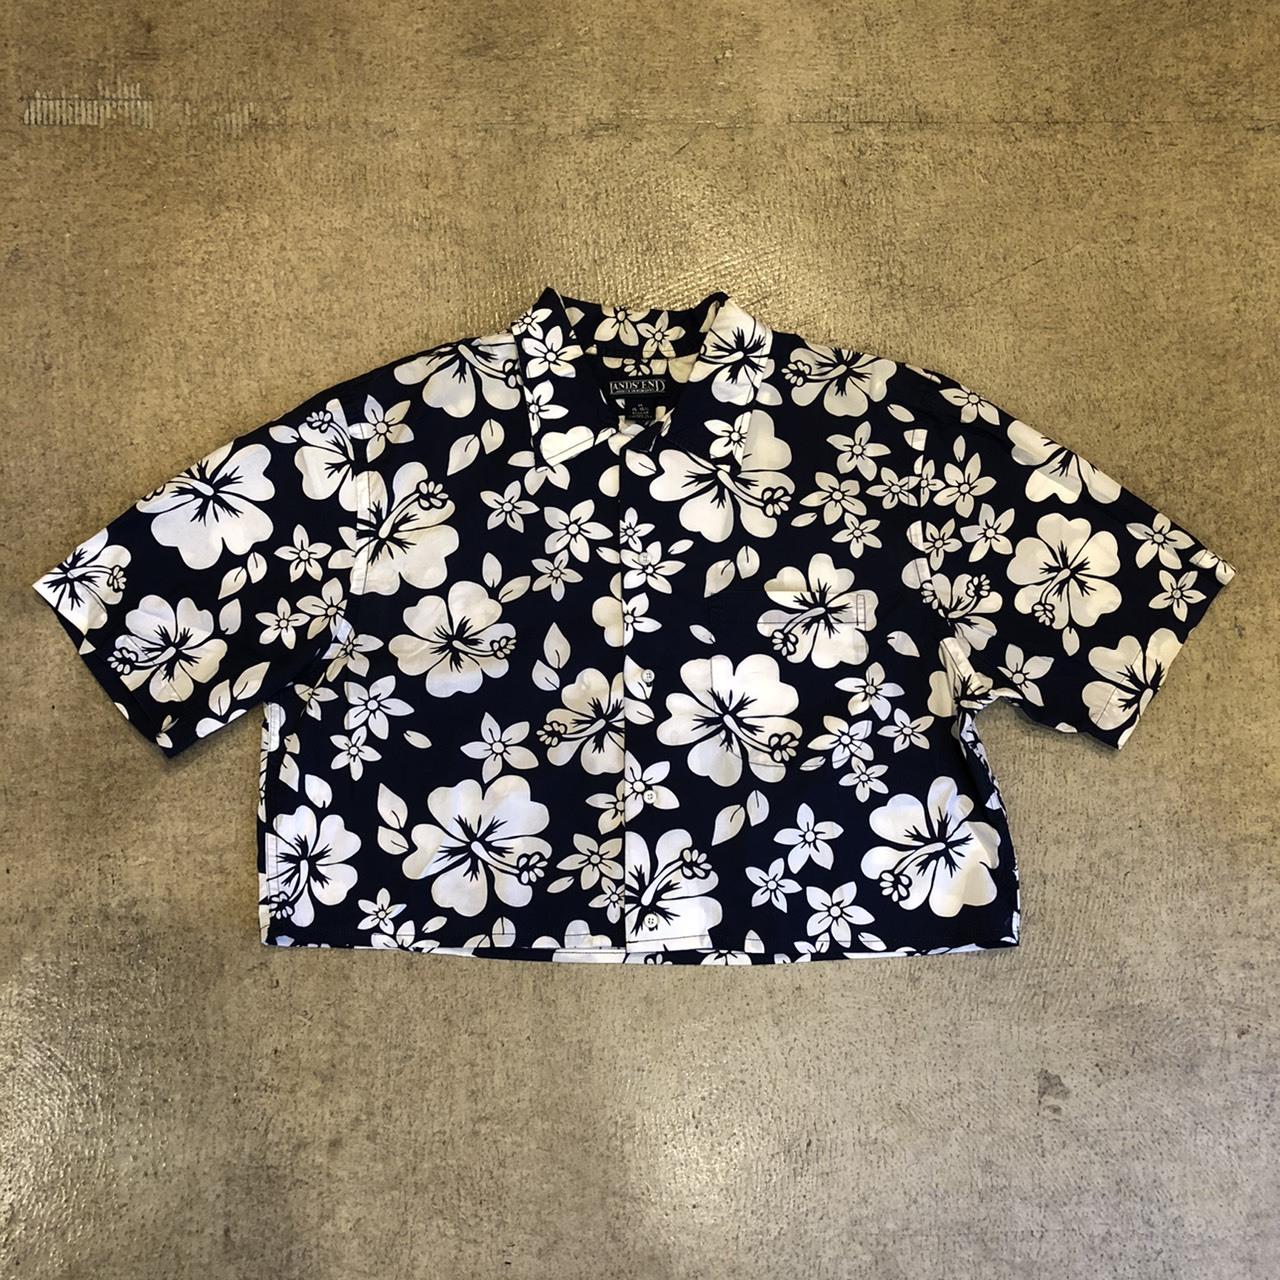 Remake Aloha Shirts No.1 ¥5,900+tax